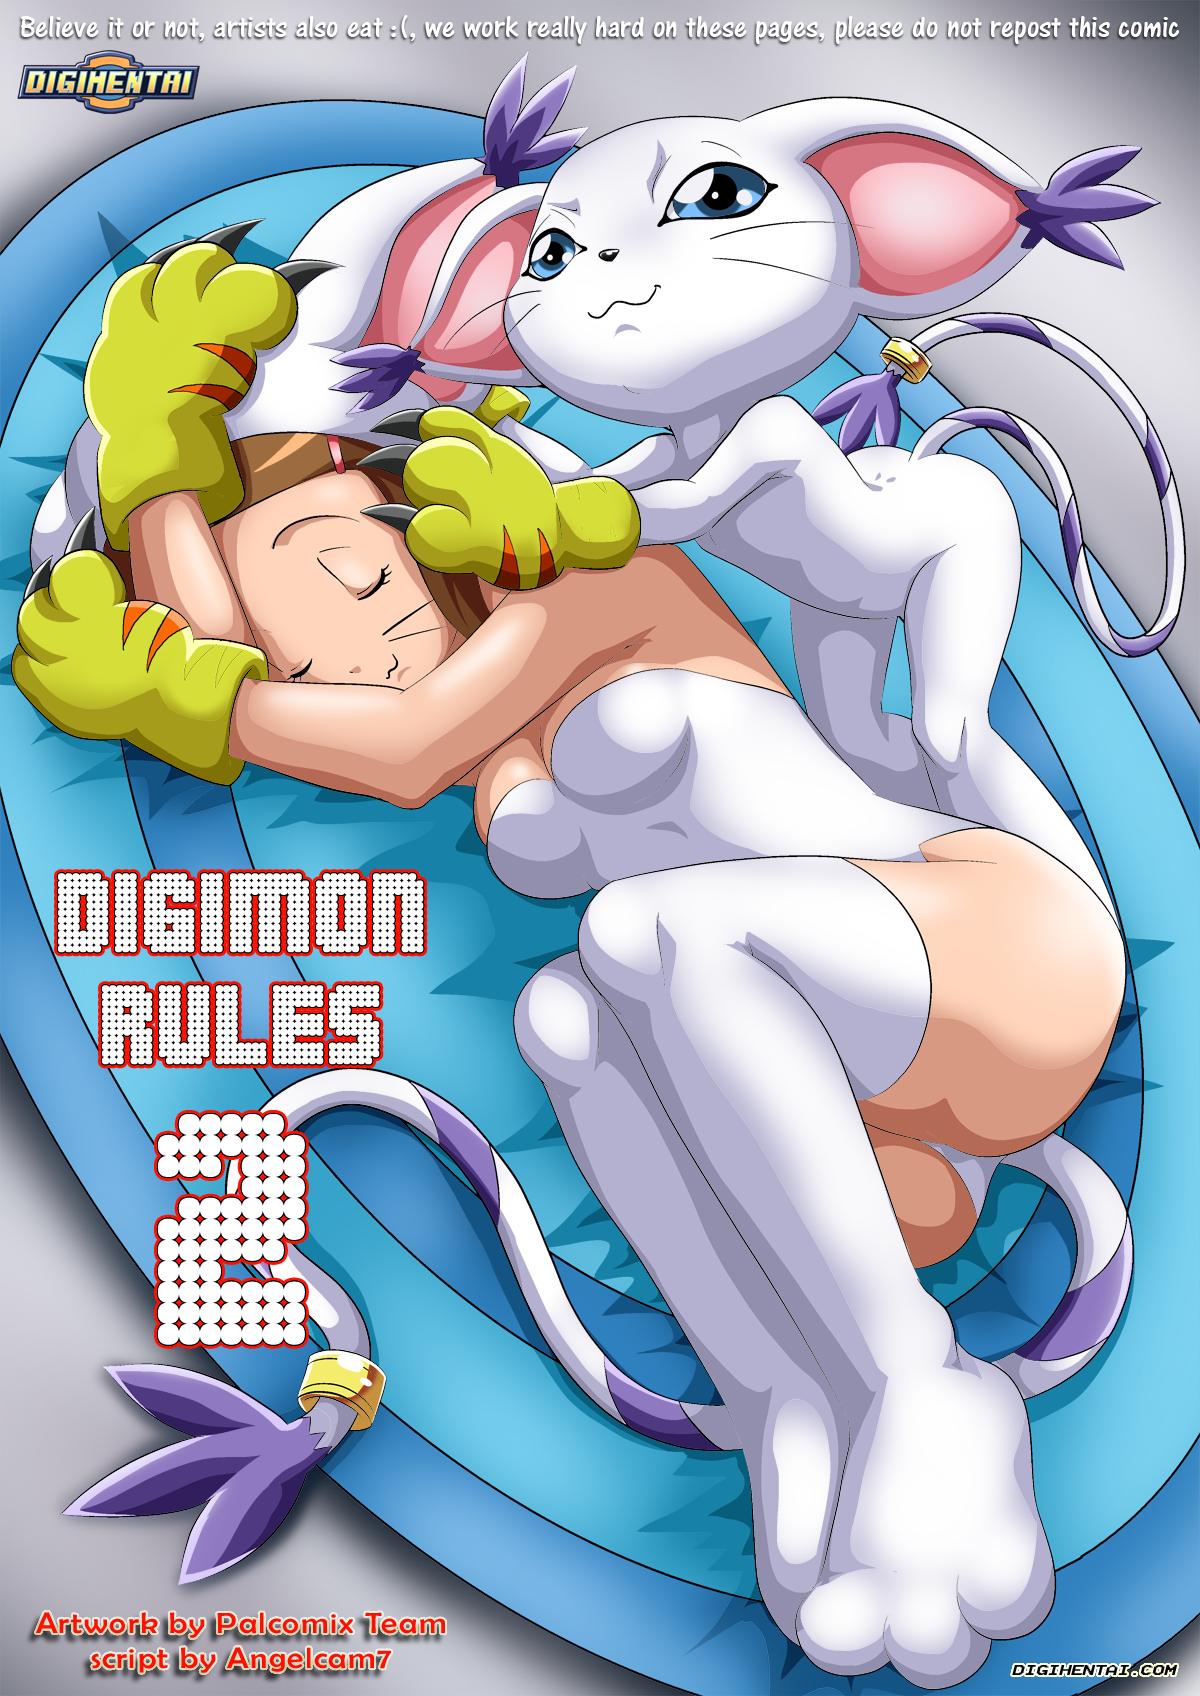 SureFap xxx porno Digimon Adventure - [Palcomix][DigiHentai] - Digimon Rules 2